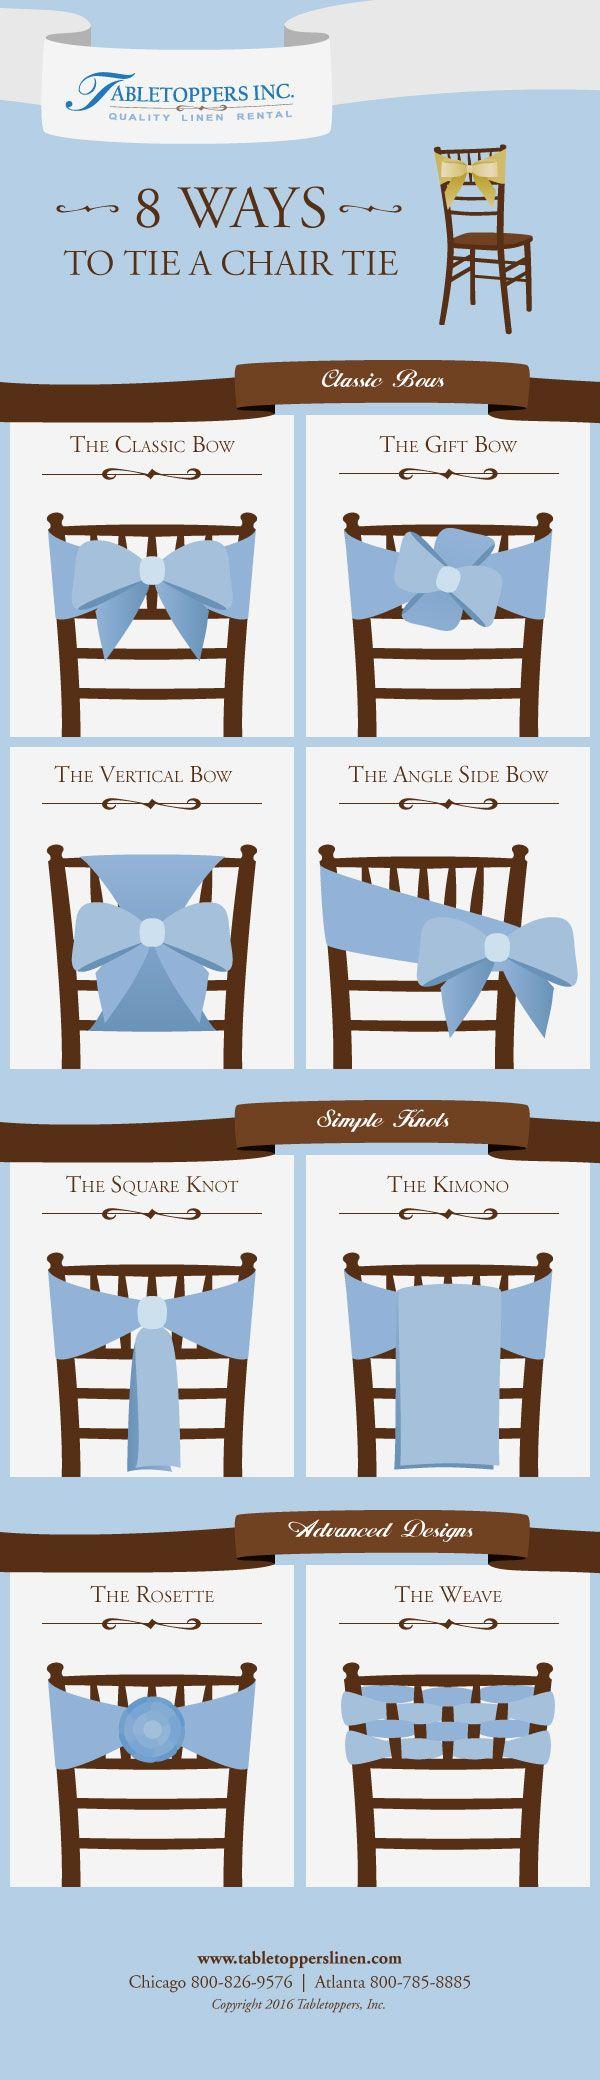 10+ Best Unique Chair Sash Ideas images  wedding chairs, chair